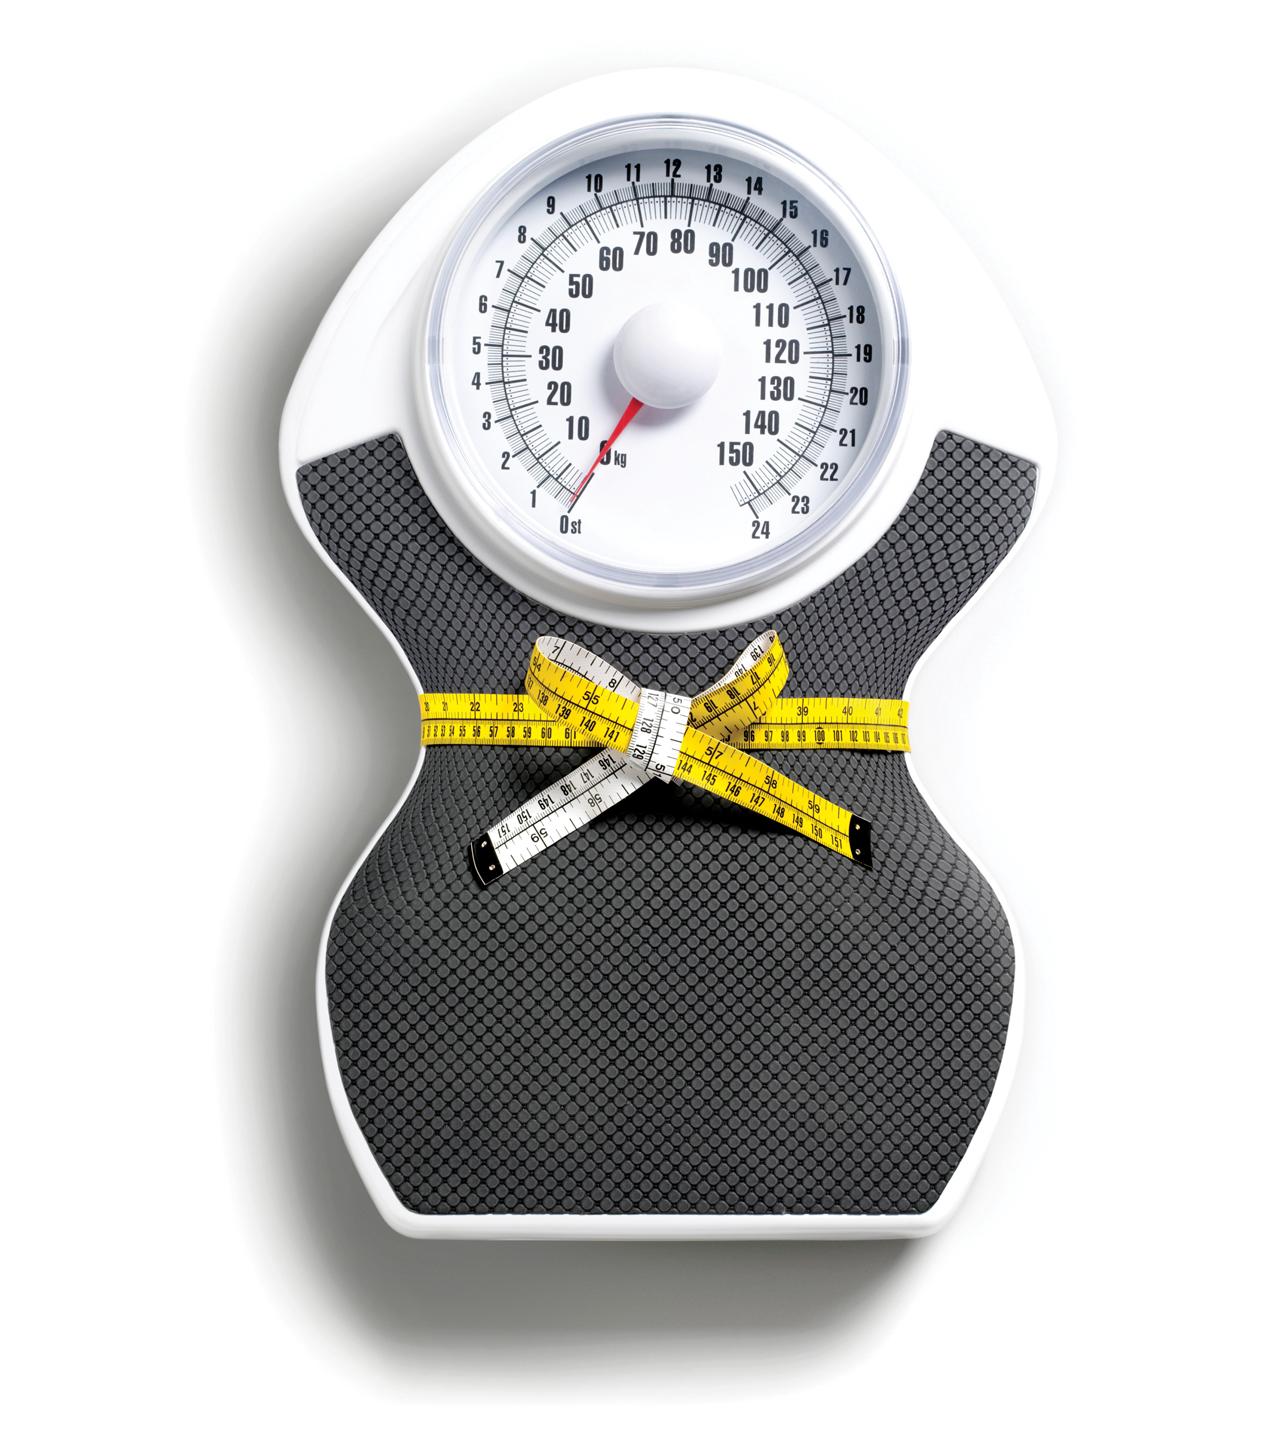 Weighing Kids In School Should Bmi Measure Success